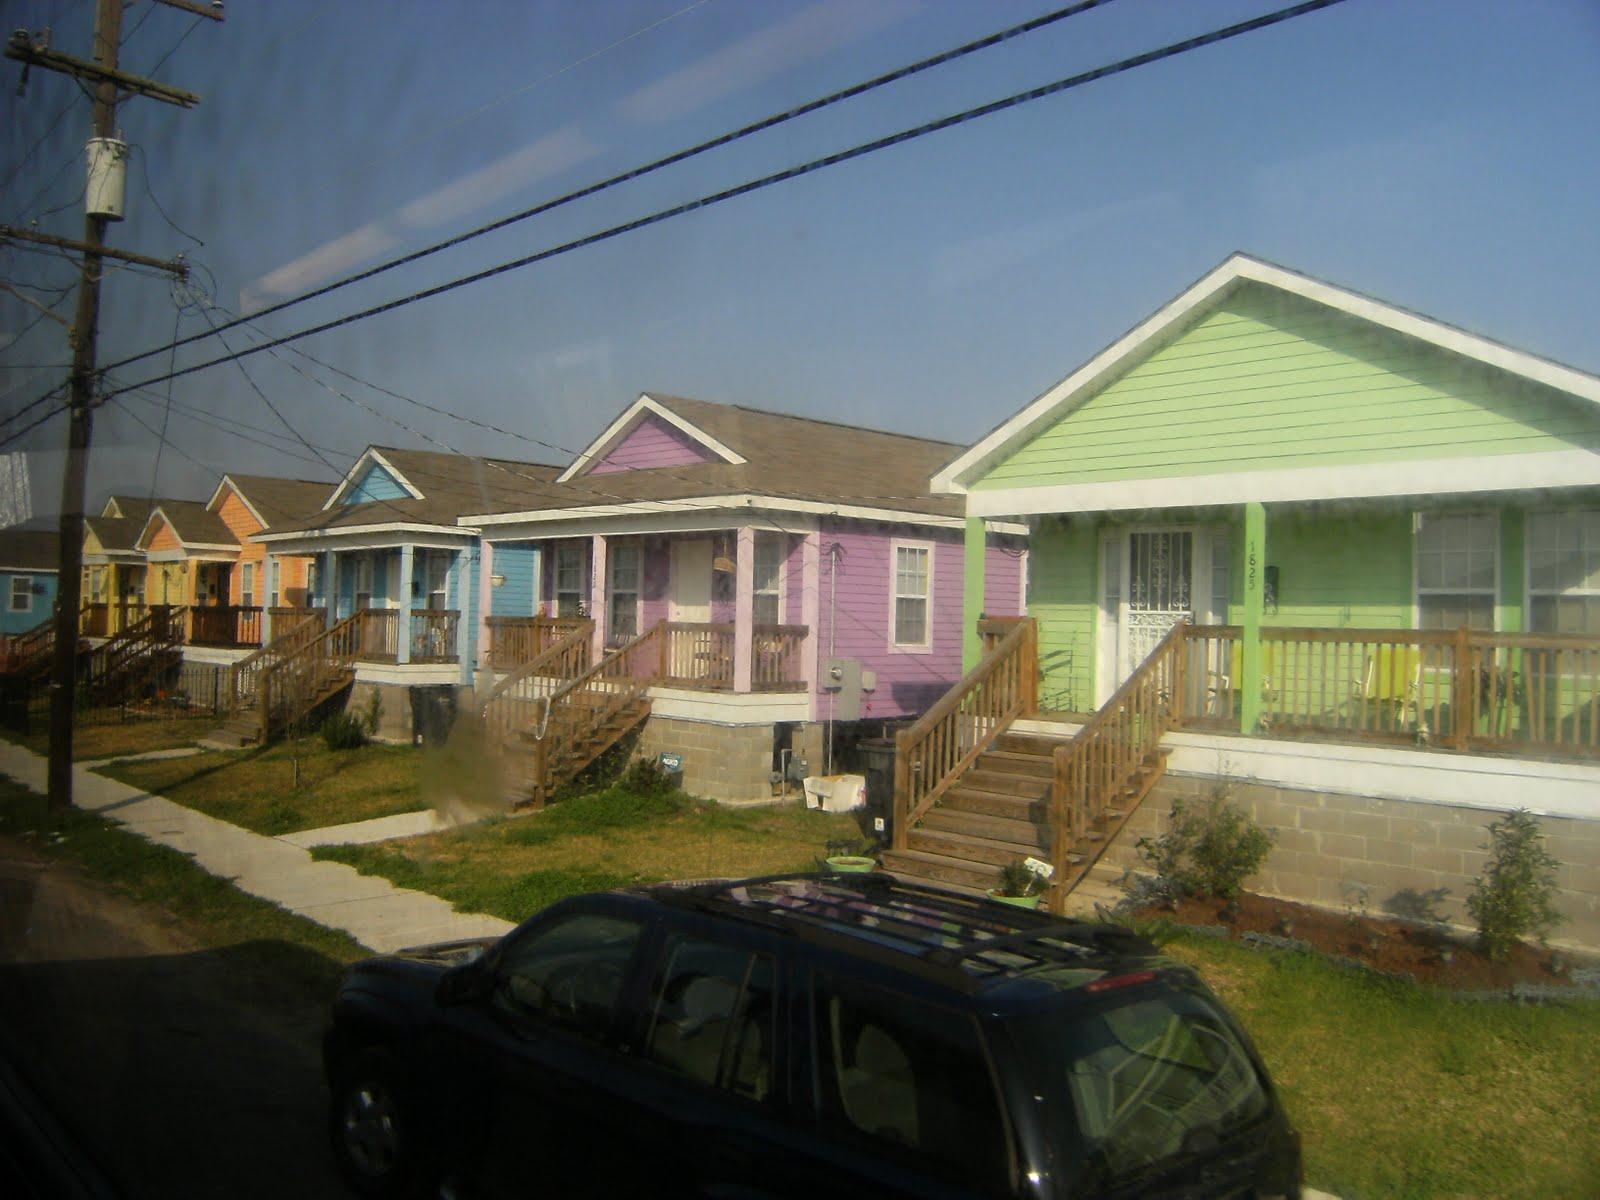 http://1.bp.blogspot.com/_uXeYANzbyRQ/THgRYId2g1I/AAAAAAAAAVA/8Rao2RaaCK4/s1600/9th+Ward+Musician%27s+Village.JPG